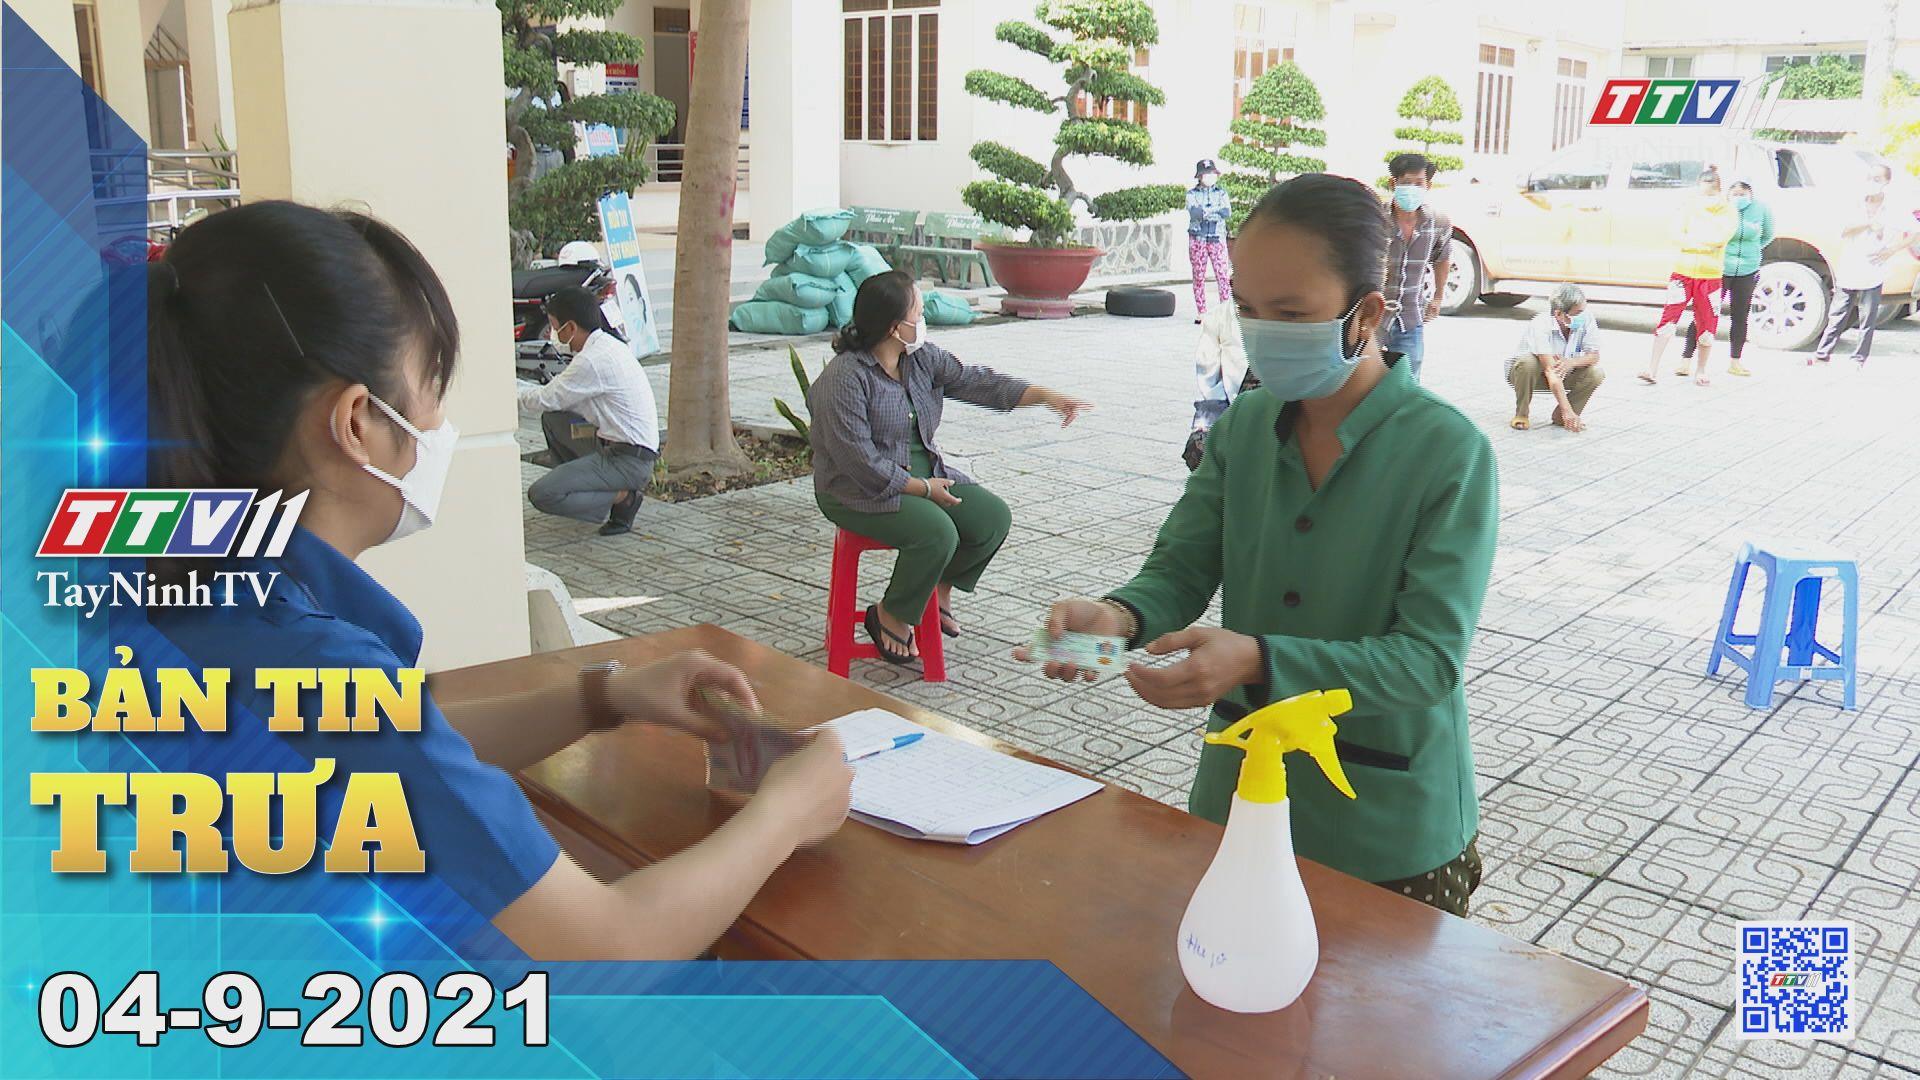 Bản tin trưa 04-9-2021 | Tin tức hôm nay | TayNinhTV